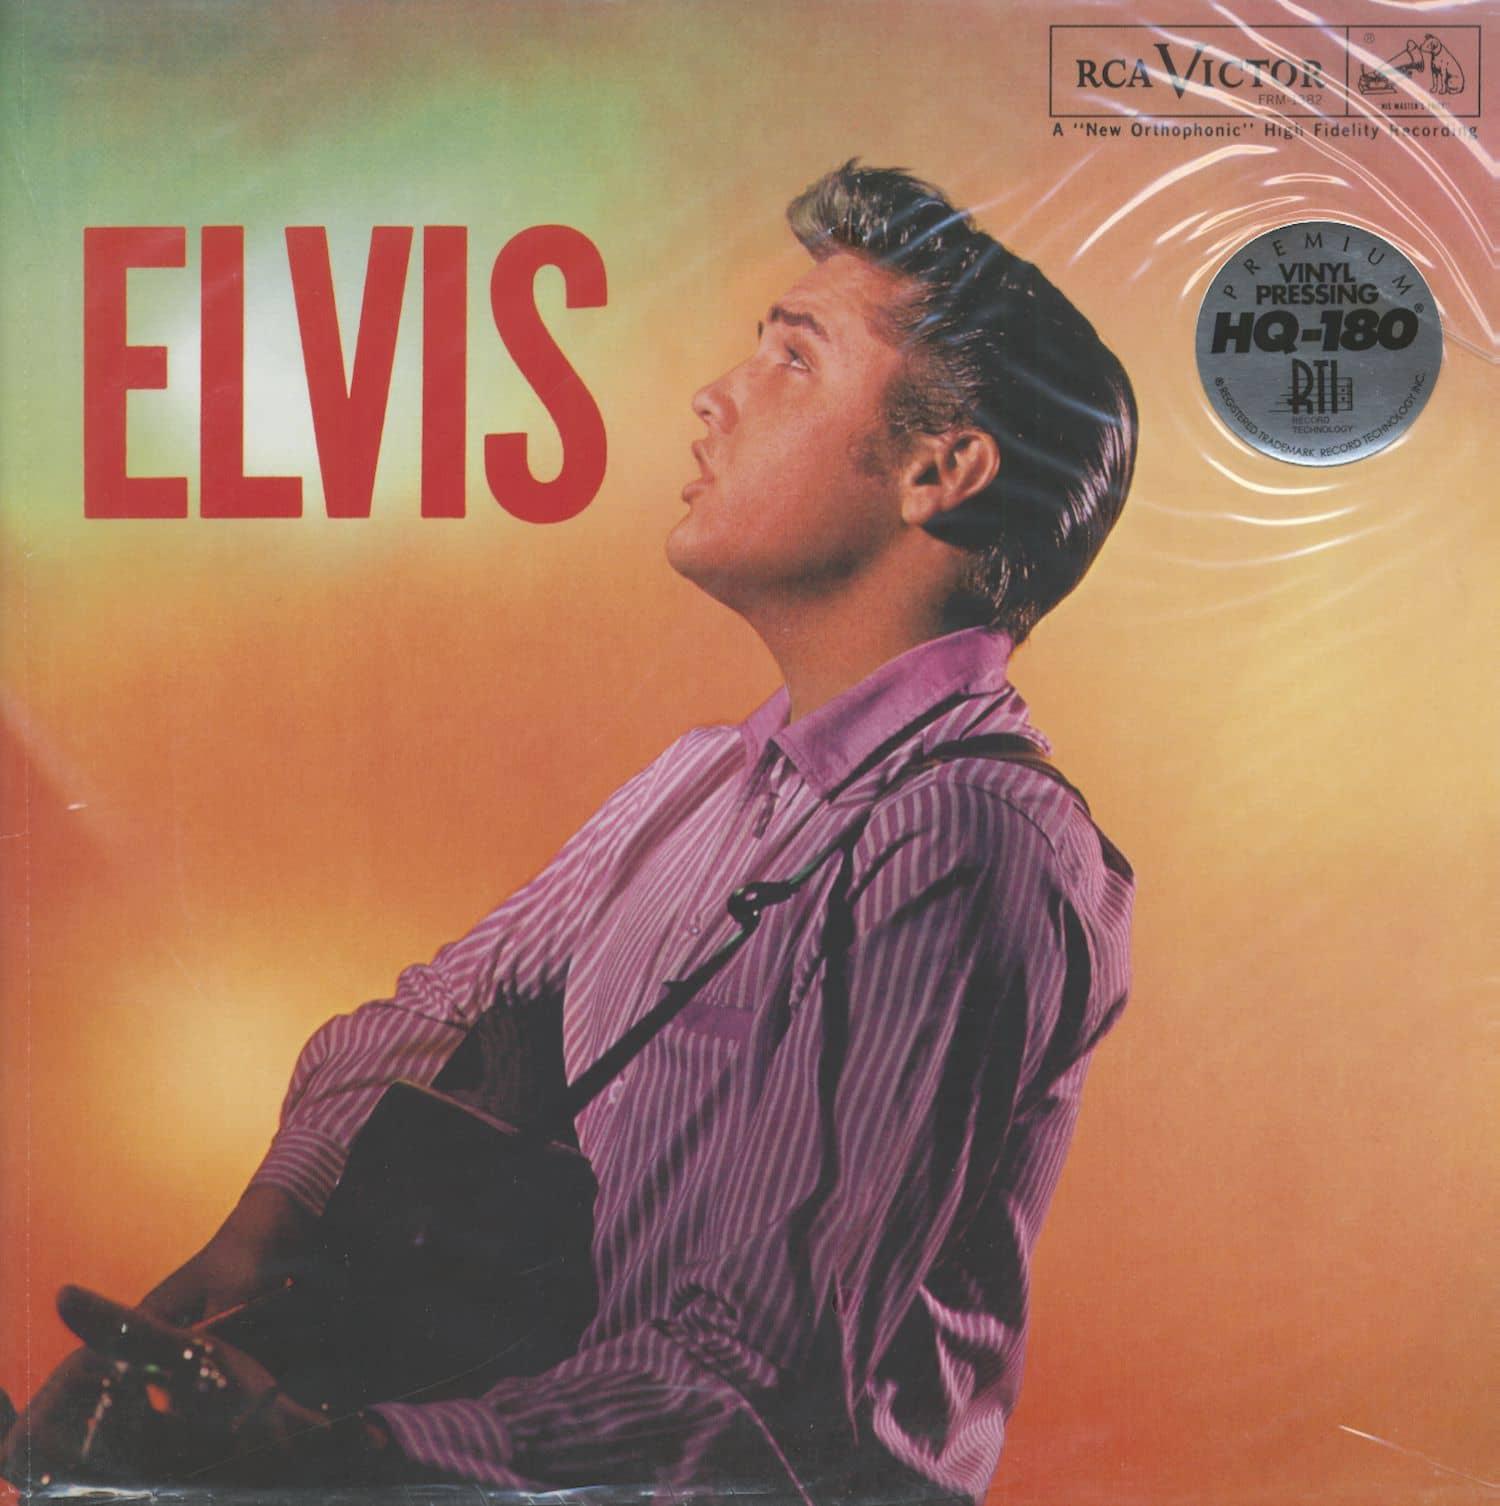 Elvis Presley Lp Elvis Lp 180g Vinyl Bear Family Records